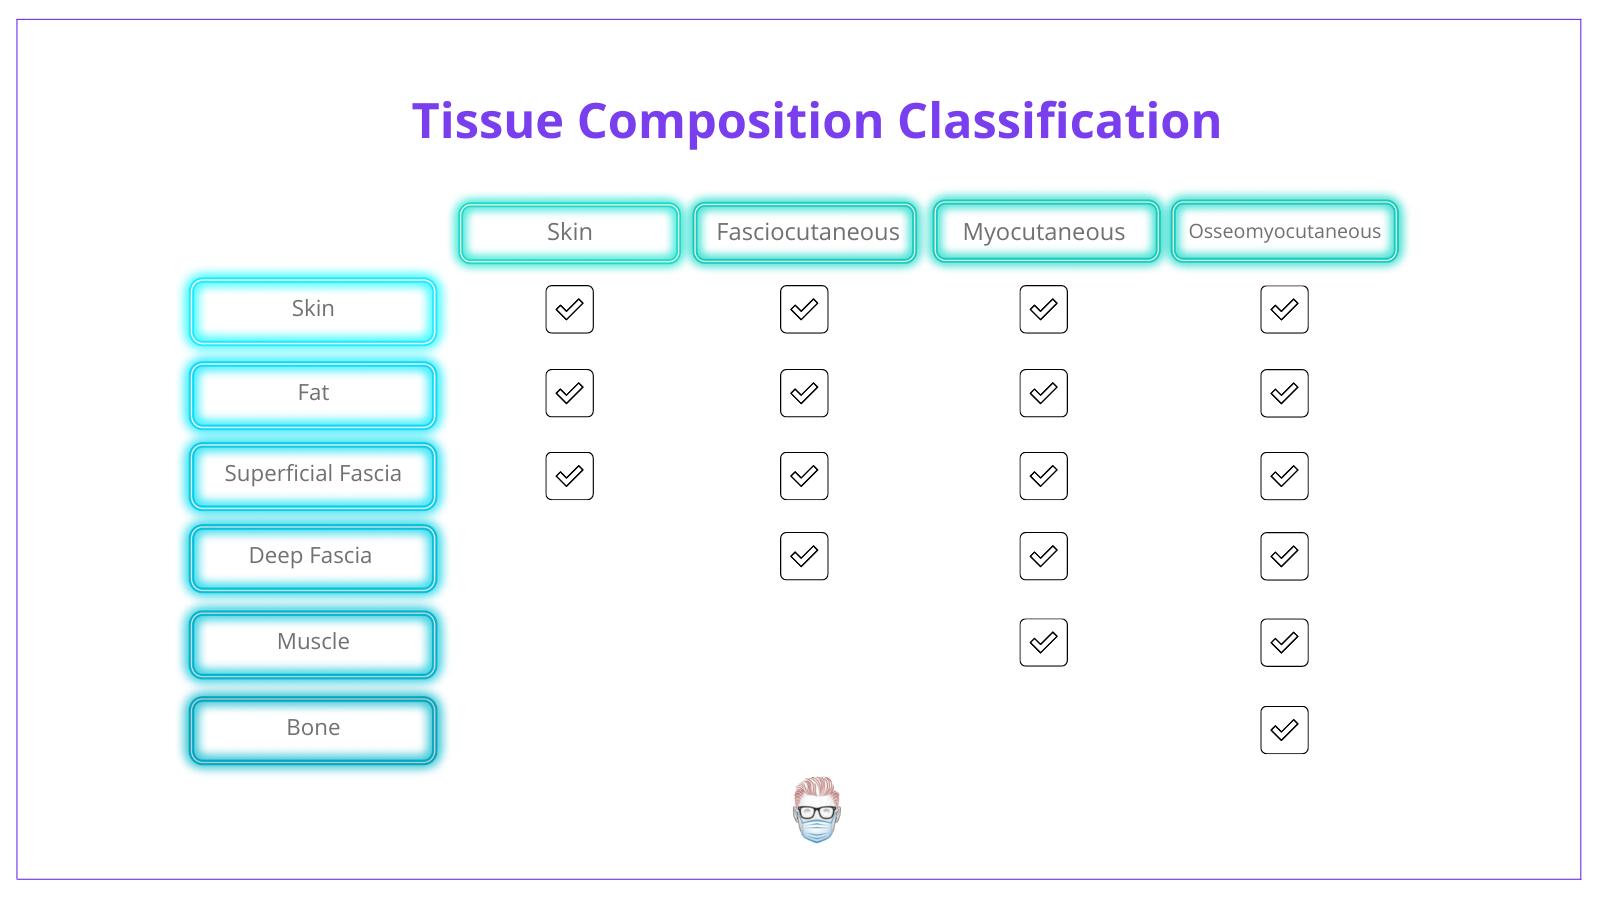 tissue composition of a flap, composition, skin flap, fasciocutaneous, myocutaneous, flap, flaps